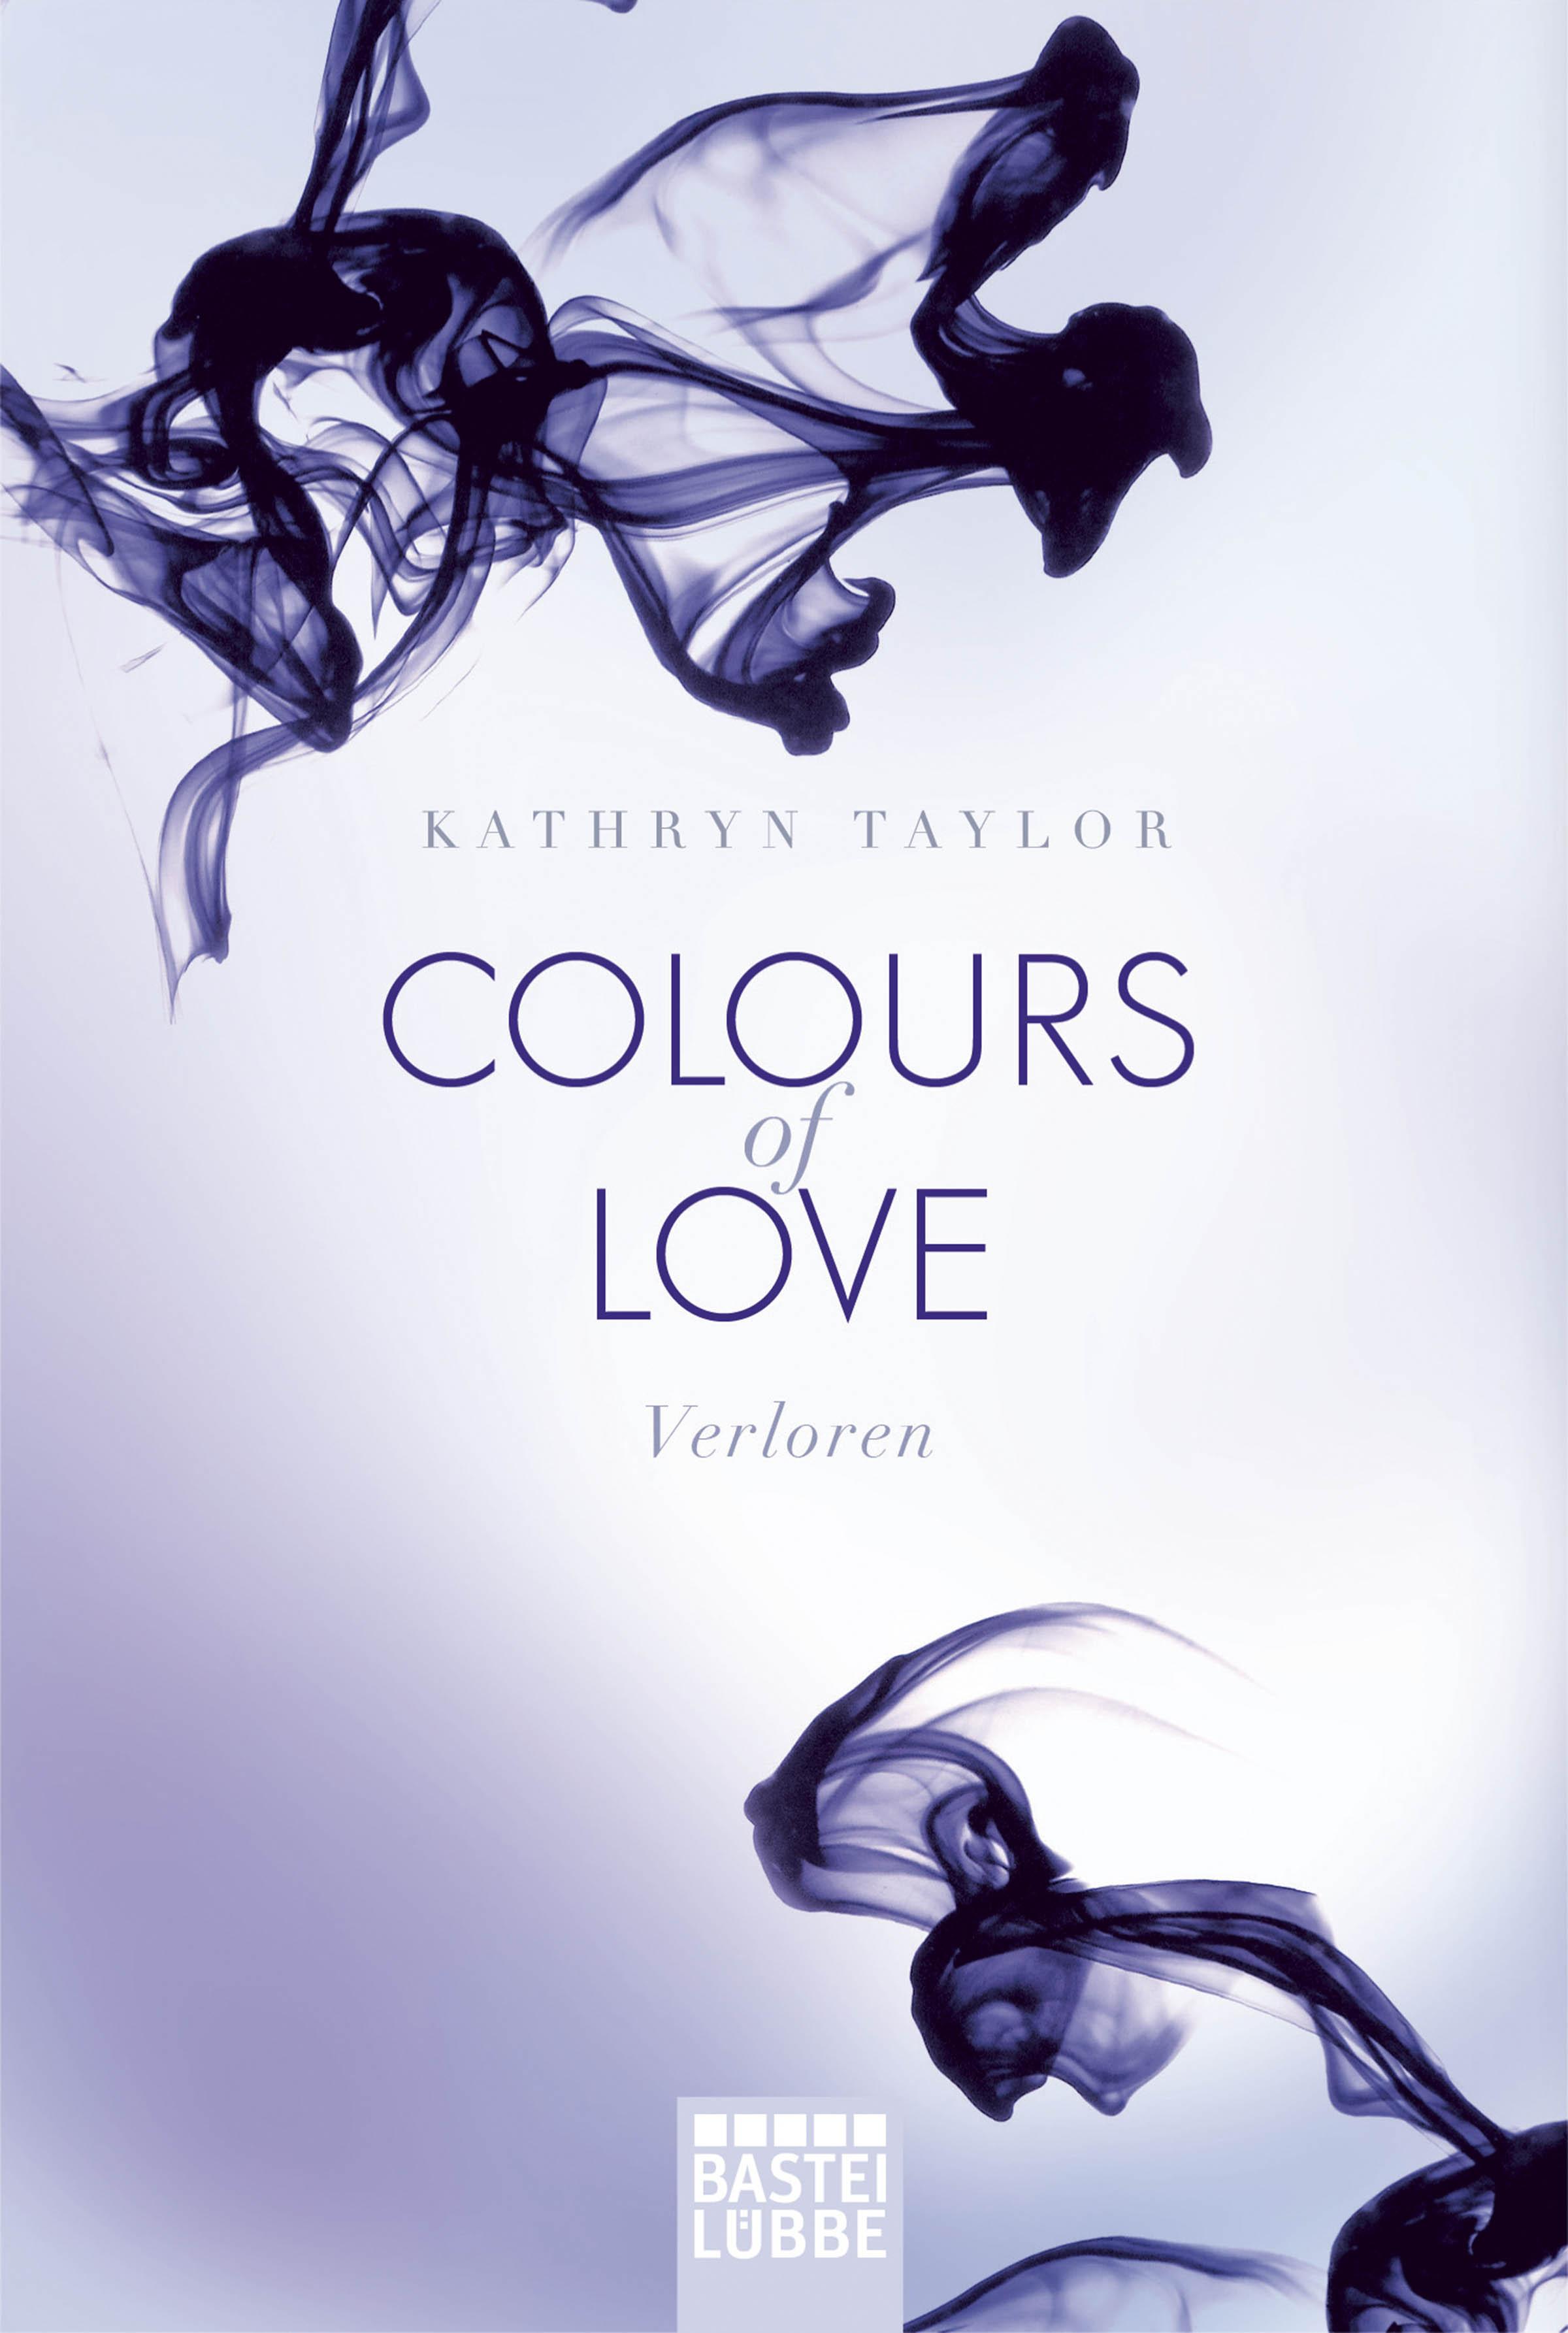 Colours of Love von Kathryn Taylor - © Bastei Lübbe